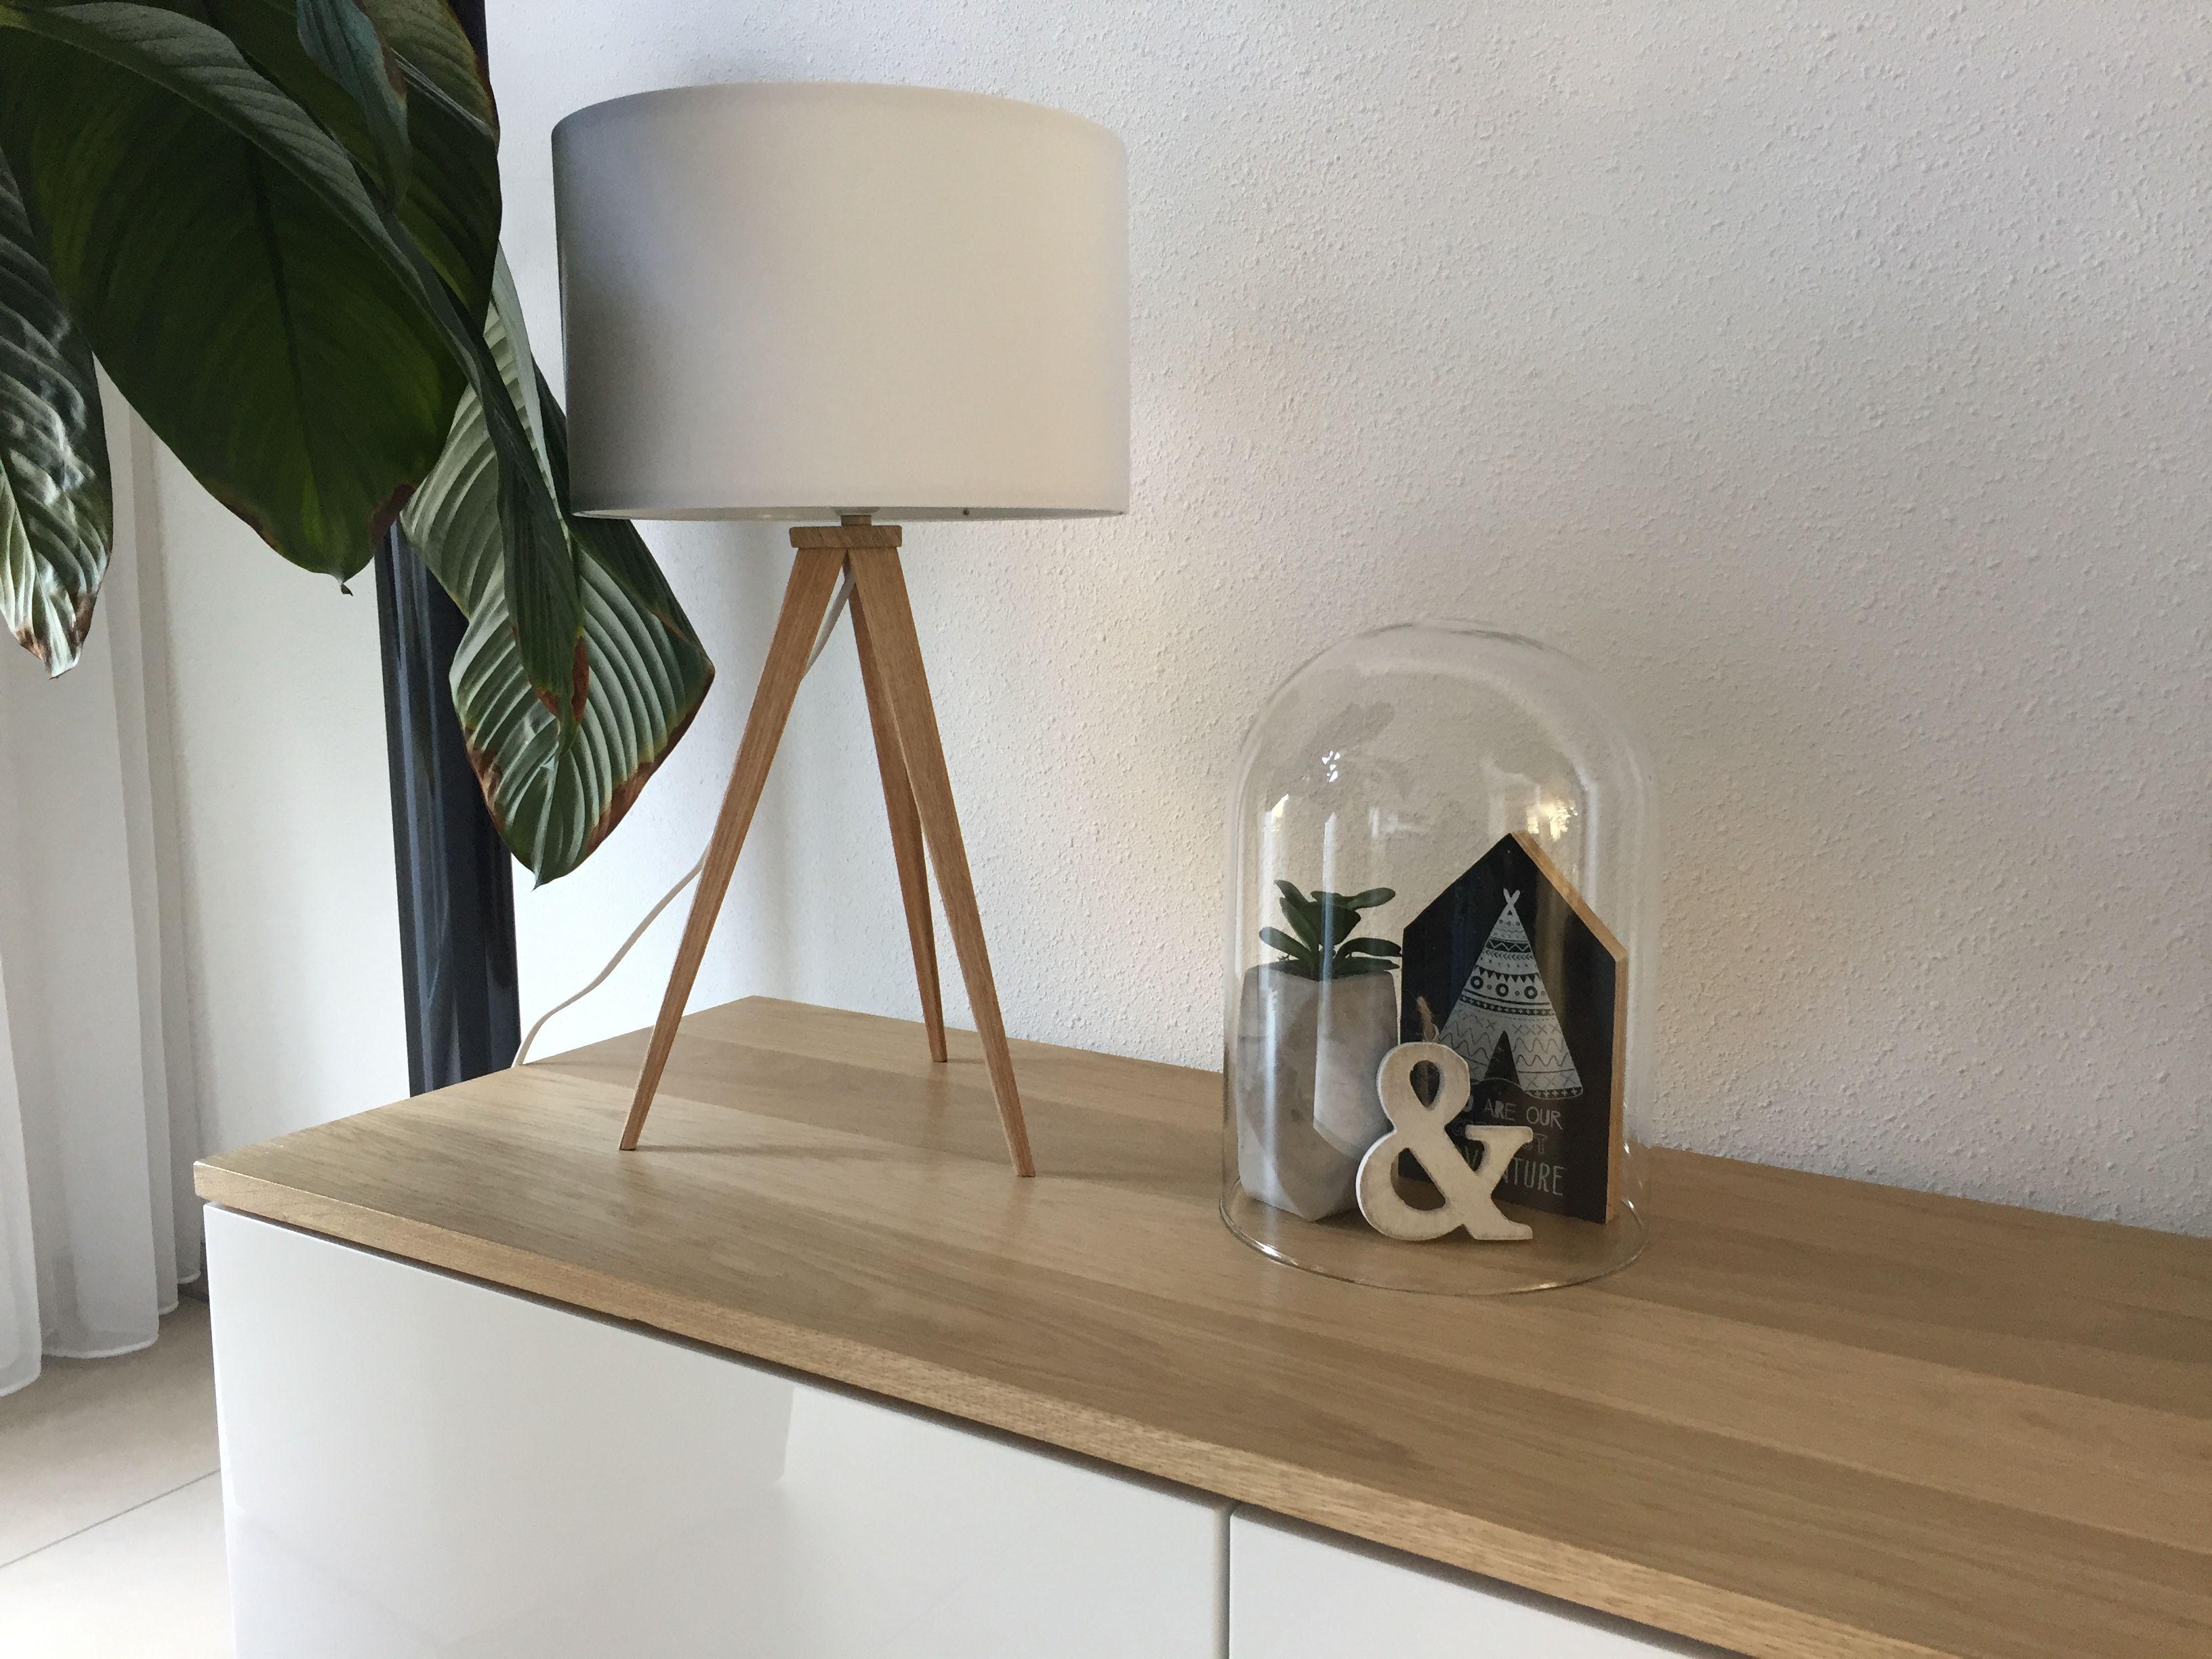 Bureaulamp Industrieel Kwantum Industriele Hanglampen Lamp